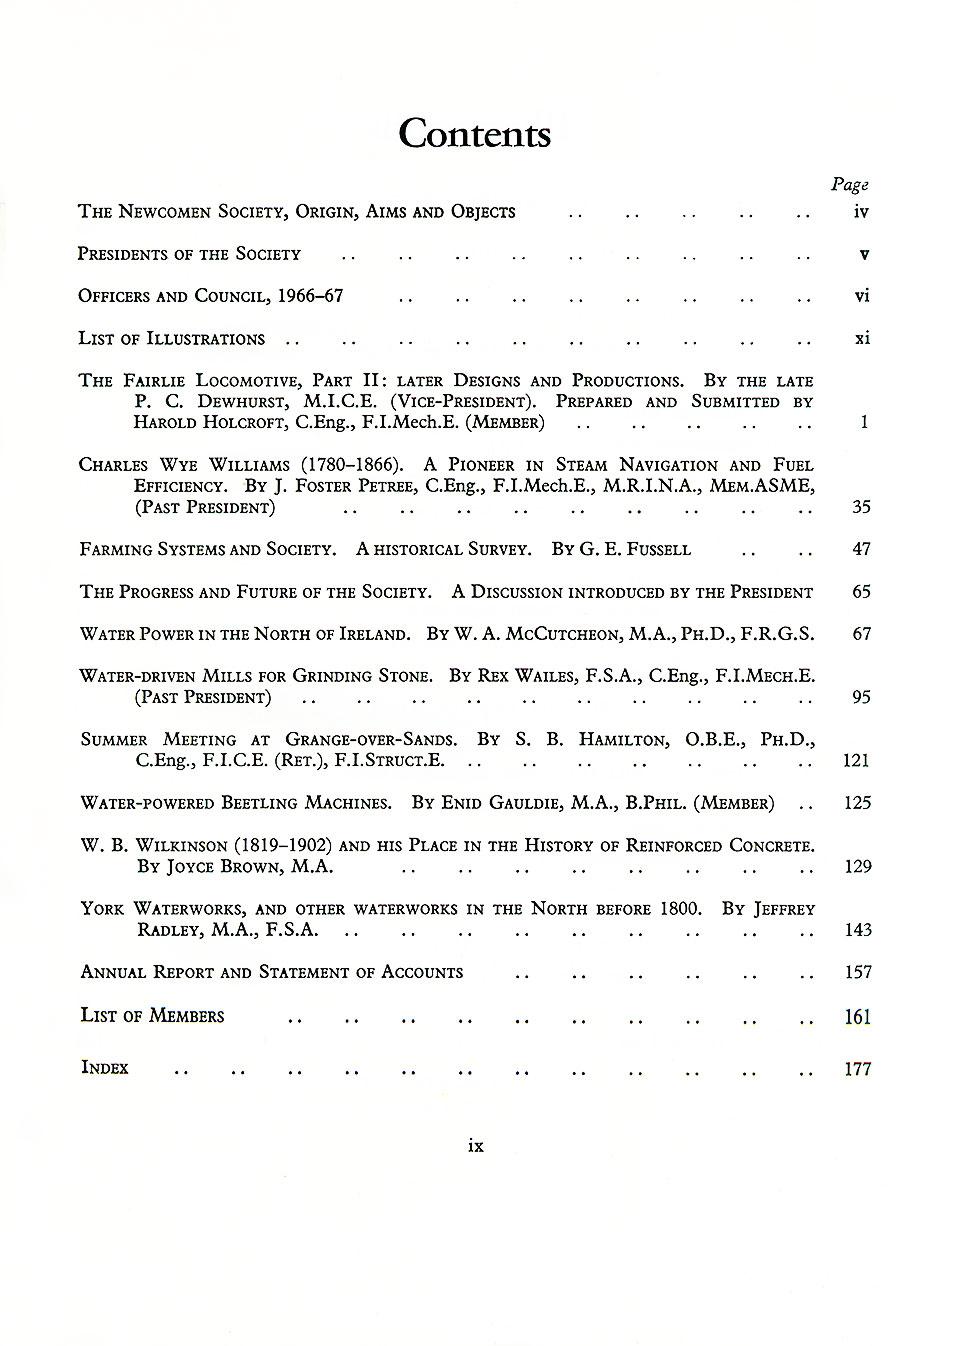 The Journal - V39 No1 1966-67 - contents Hardback